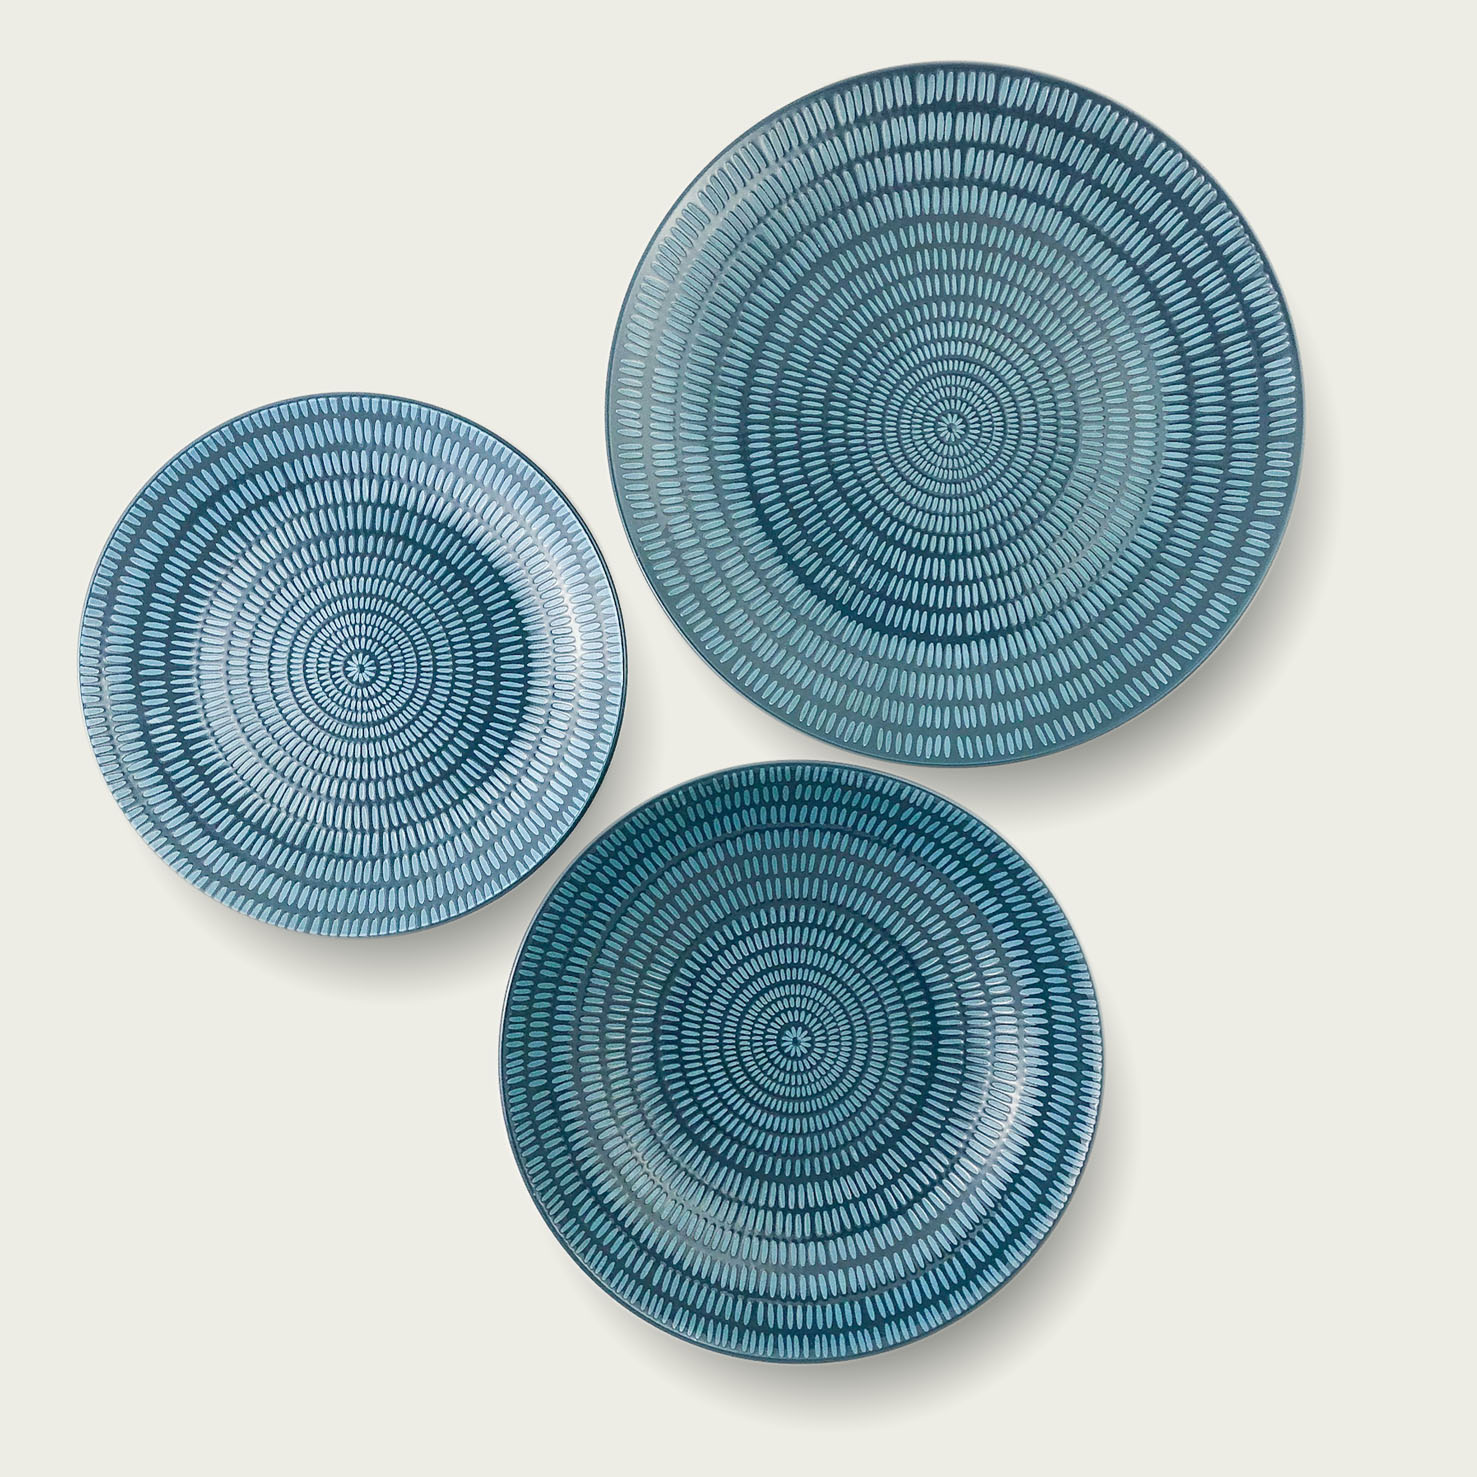 Servizio 18 piatti - cuerda seca ethinc chic-blu scuro